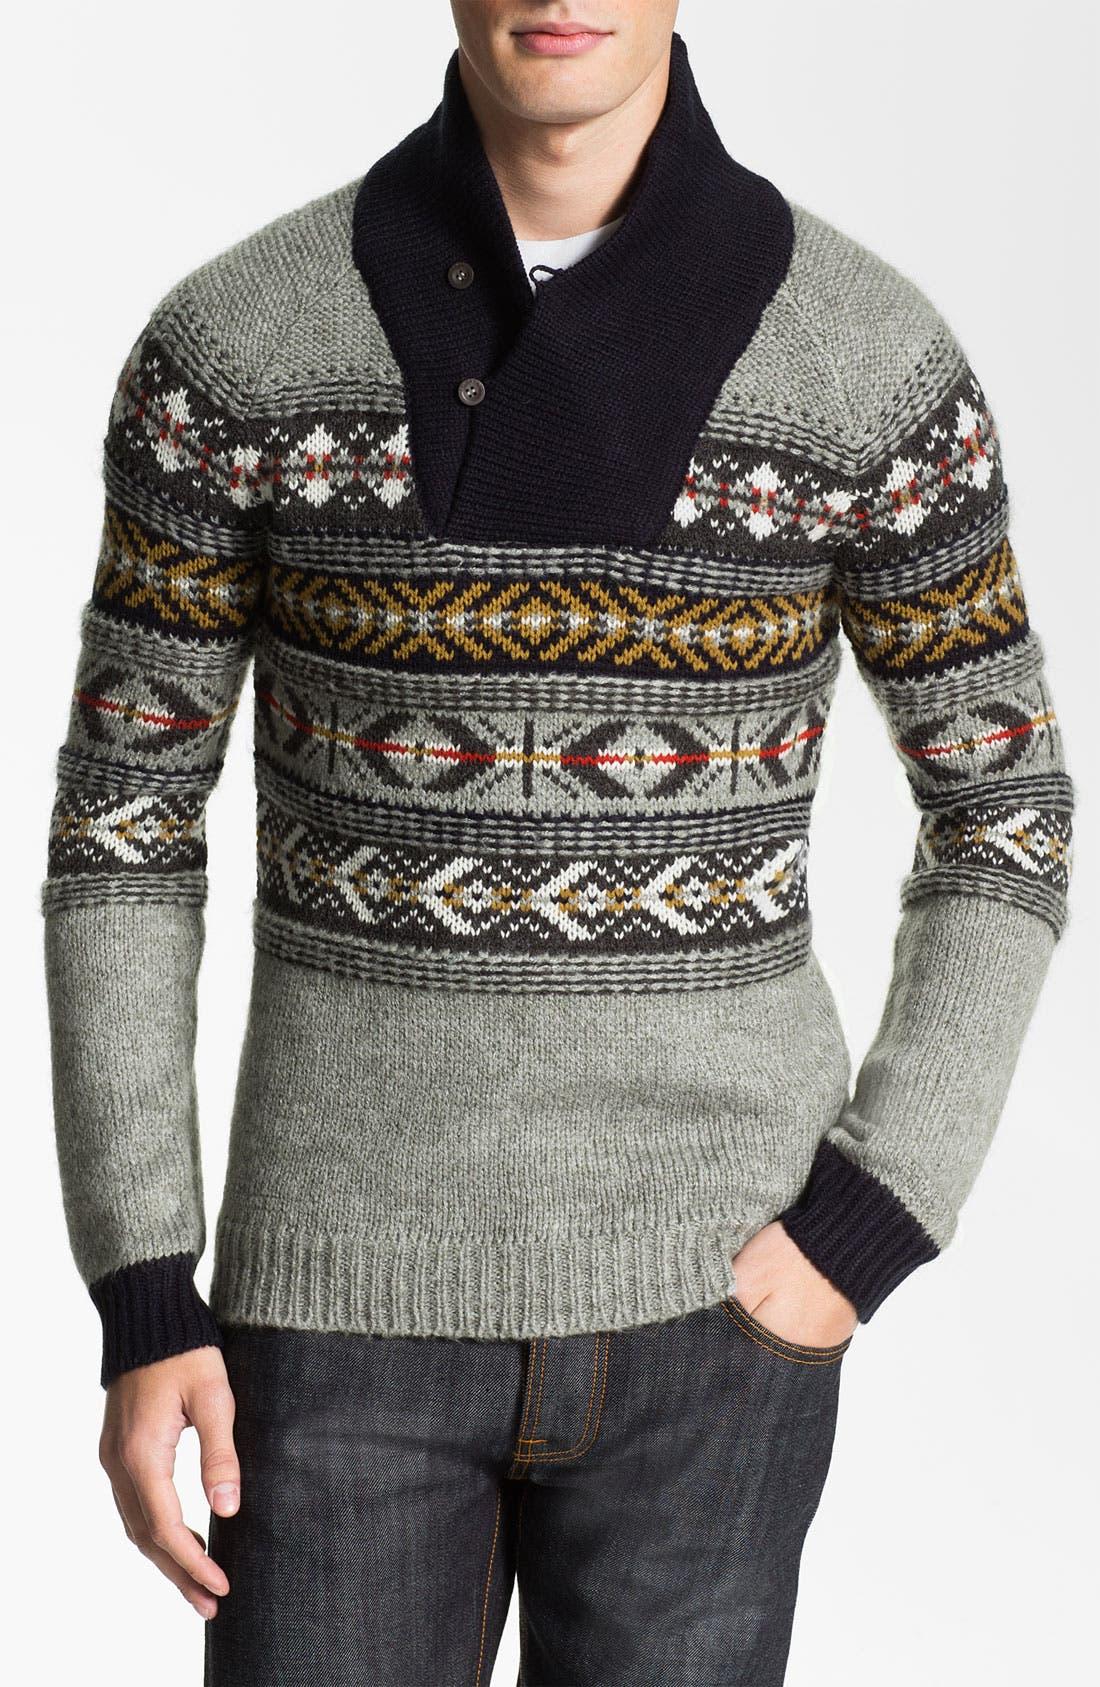 Main Image - J.C. Rags Jacquard Shawl Collar Sweater